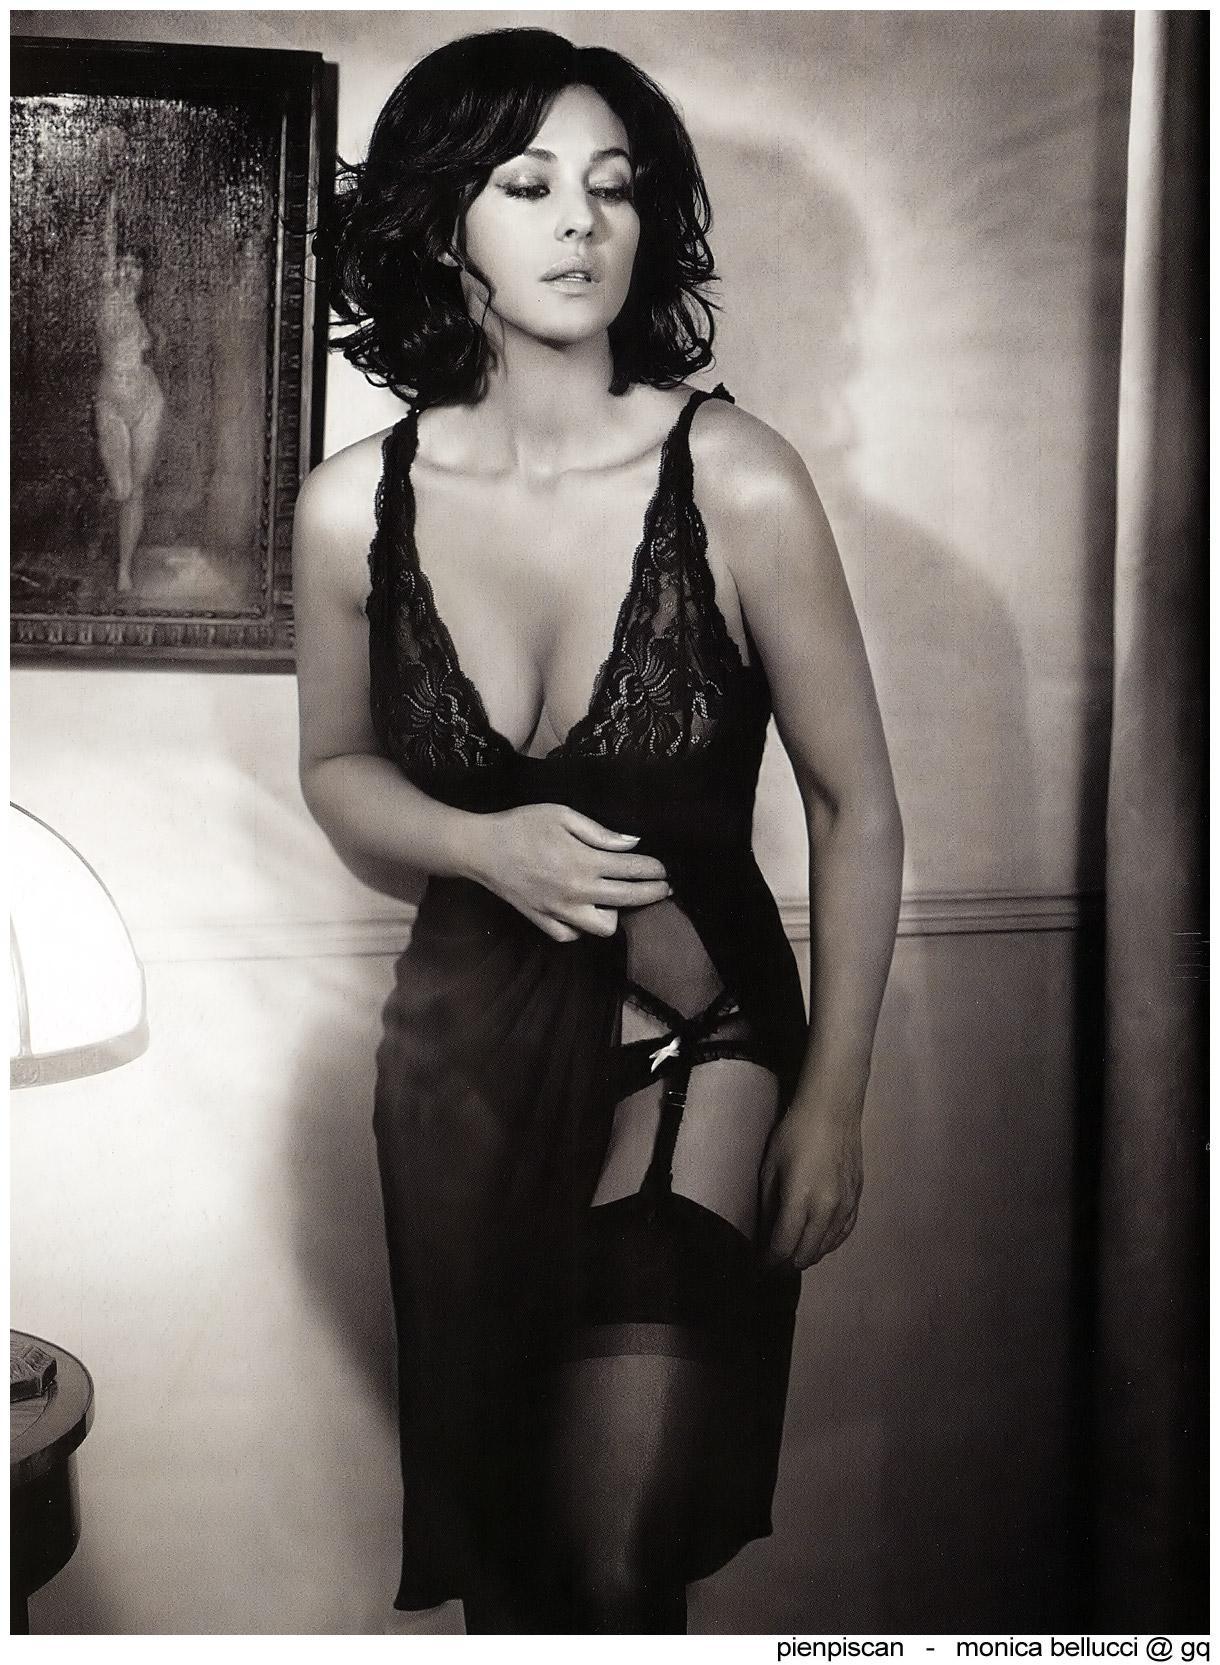 Monica Bellucci famosas desnudas fotos